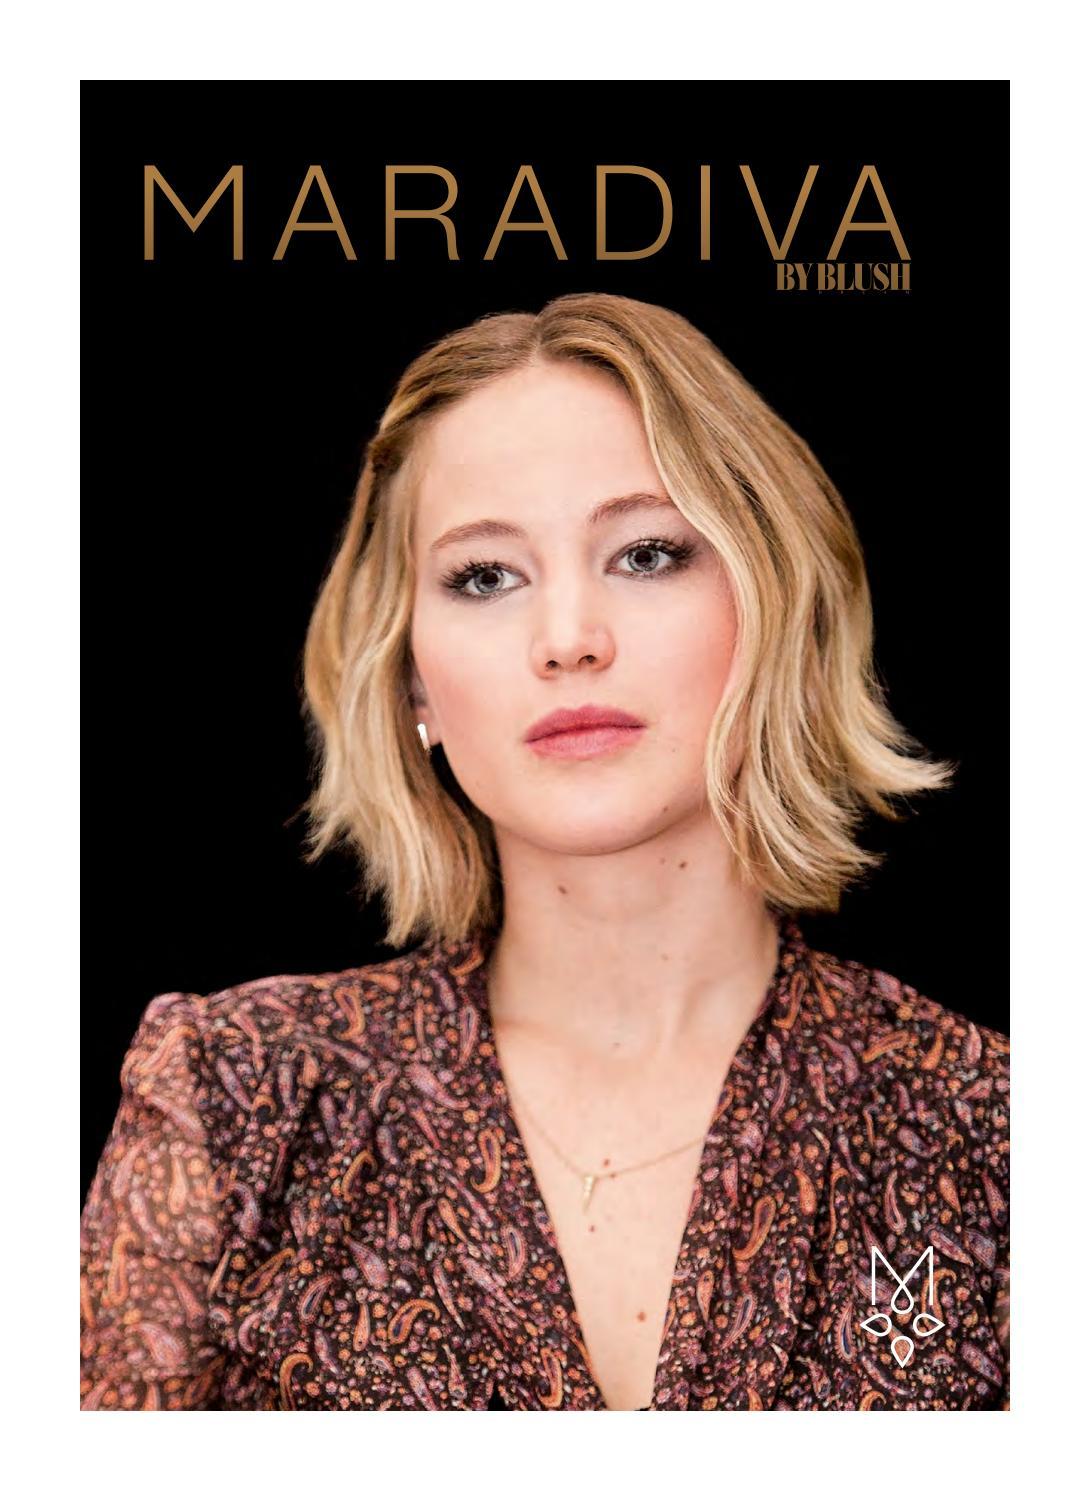 d2ebc60d79 Maradiva2017 by Editions BLUSH - issuu